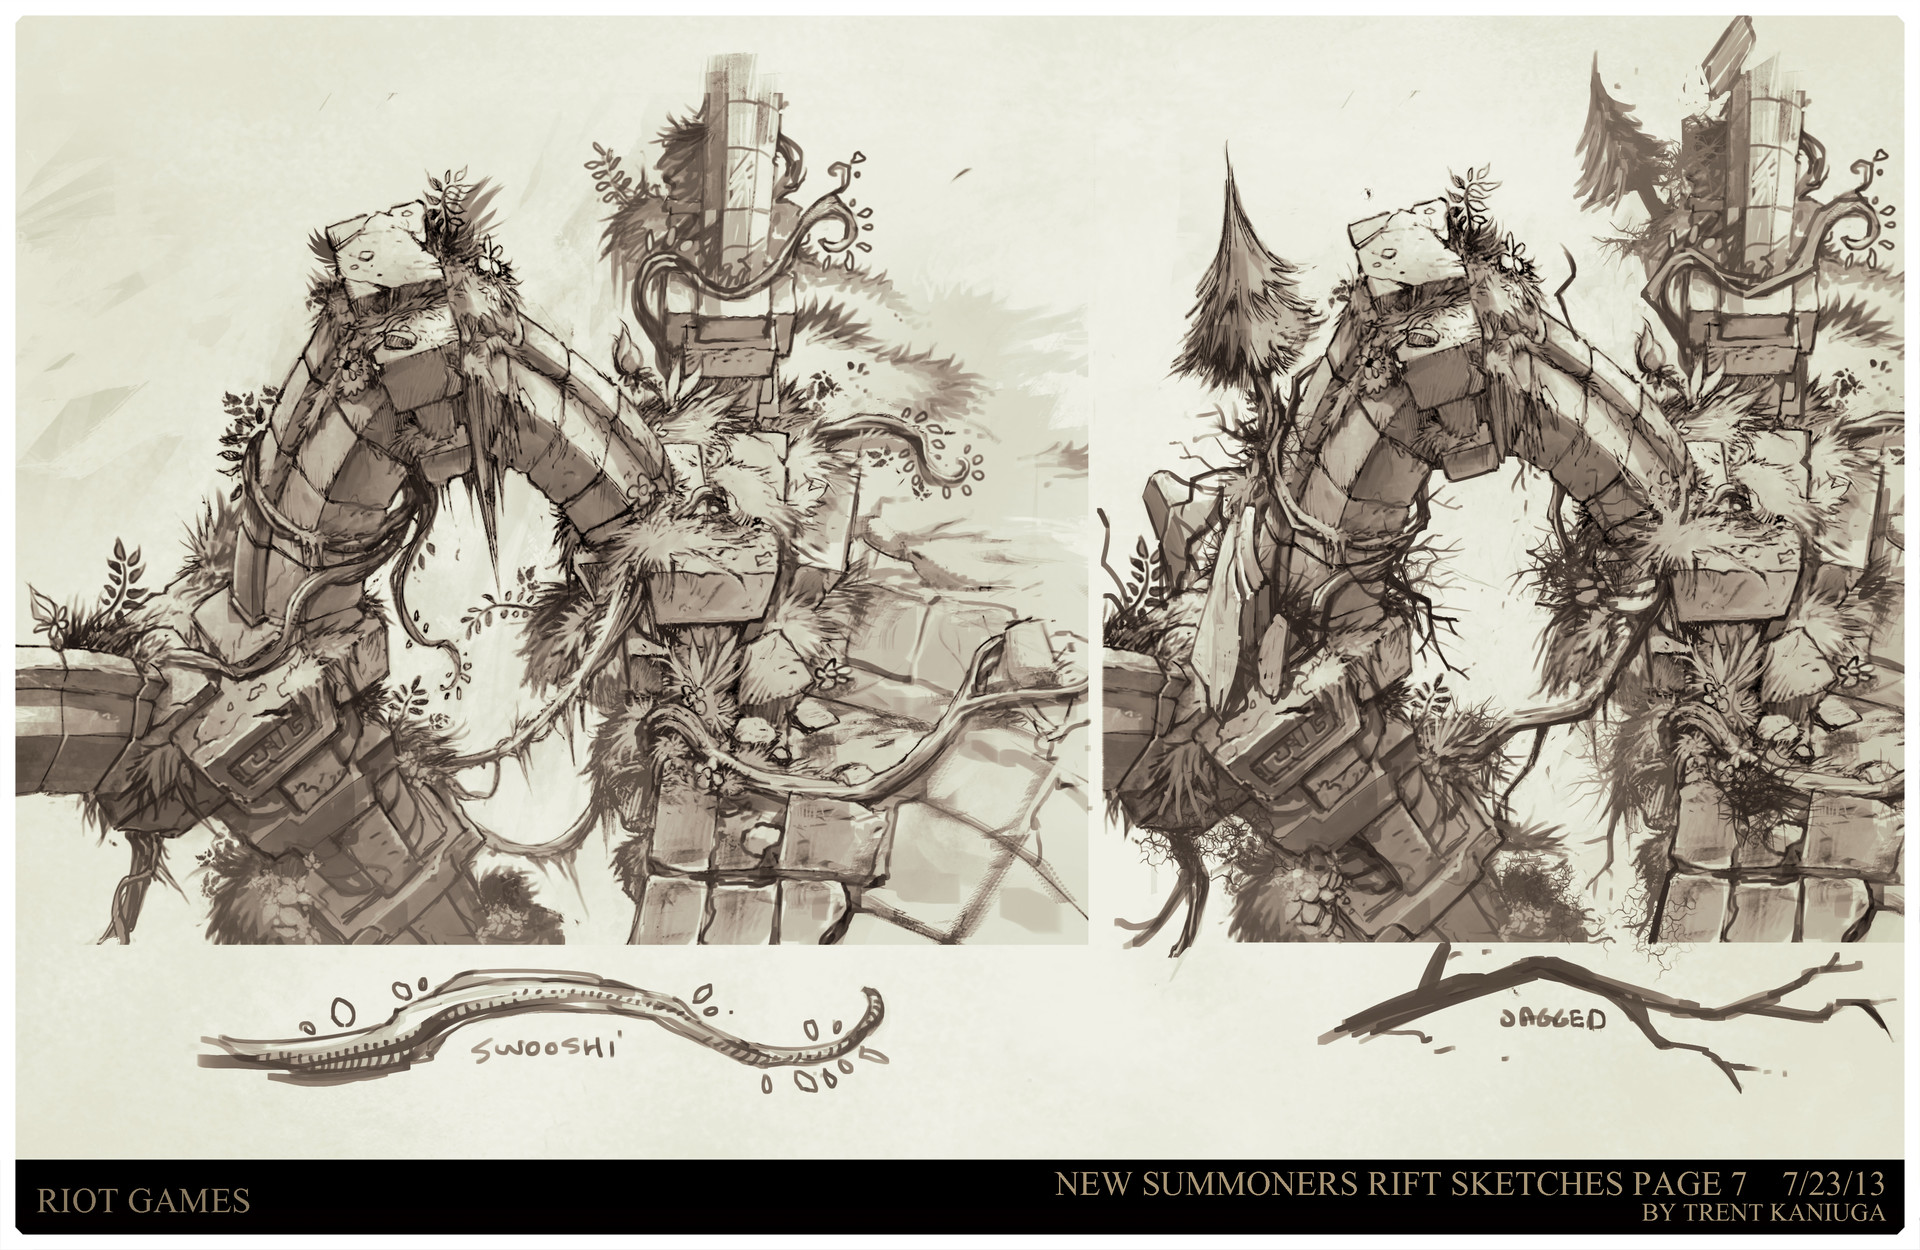 ArtStation   League Of Legends, Summoners Rift Update Architecture Concept  Art, Trent Kaniuga